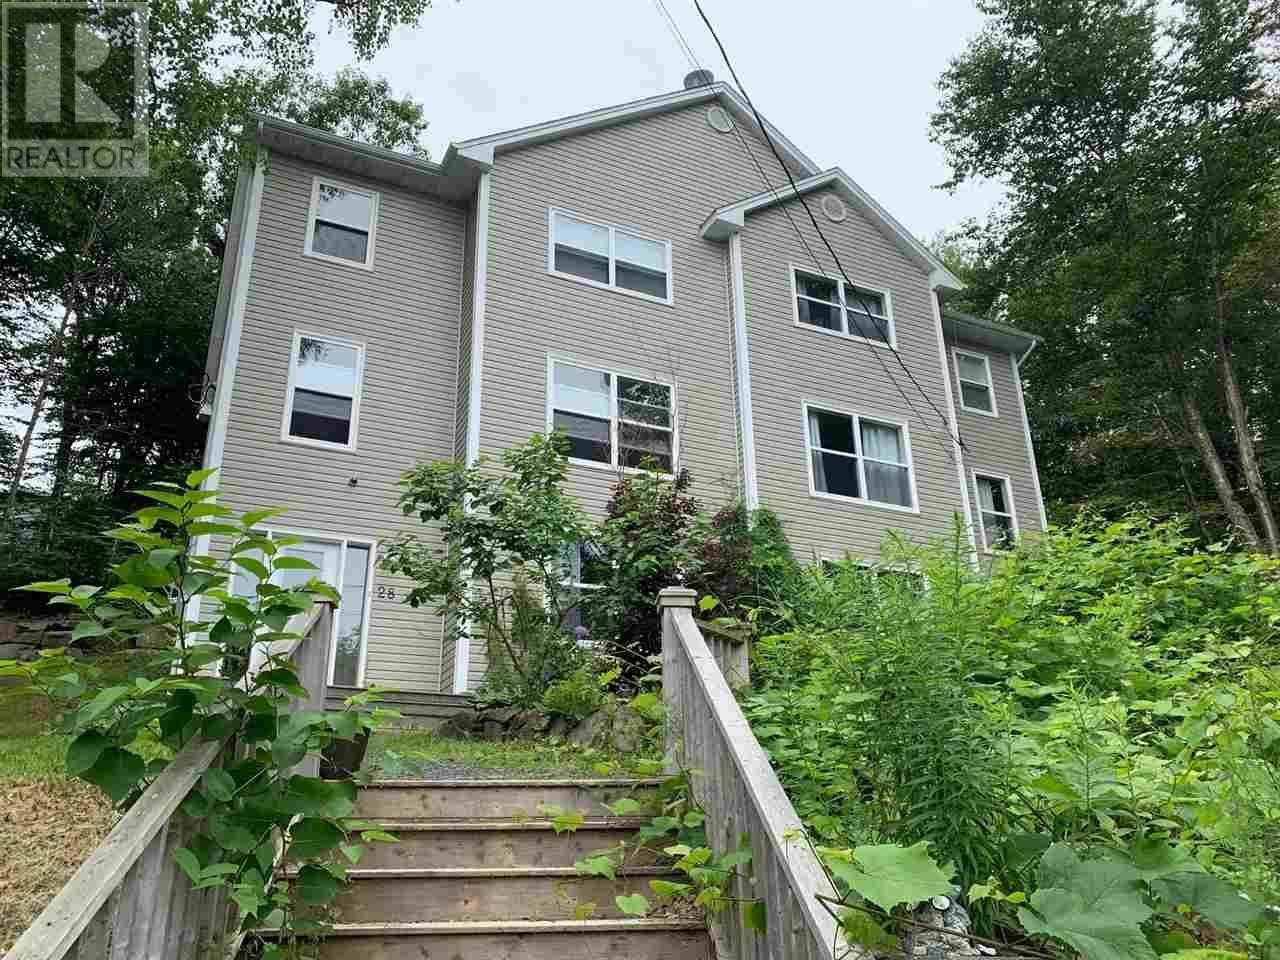 House for sale at 30 Northumberland Ln Halifax Nova Scotia - MLS: 201916898